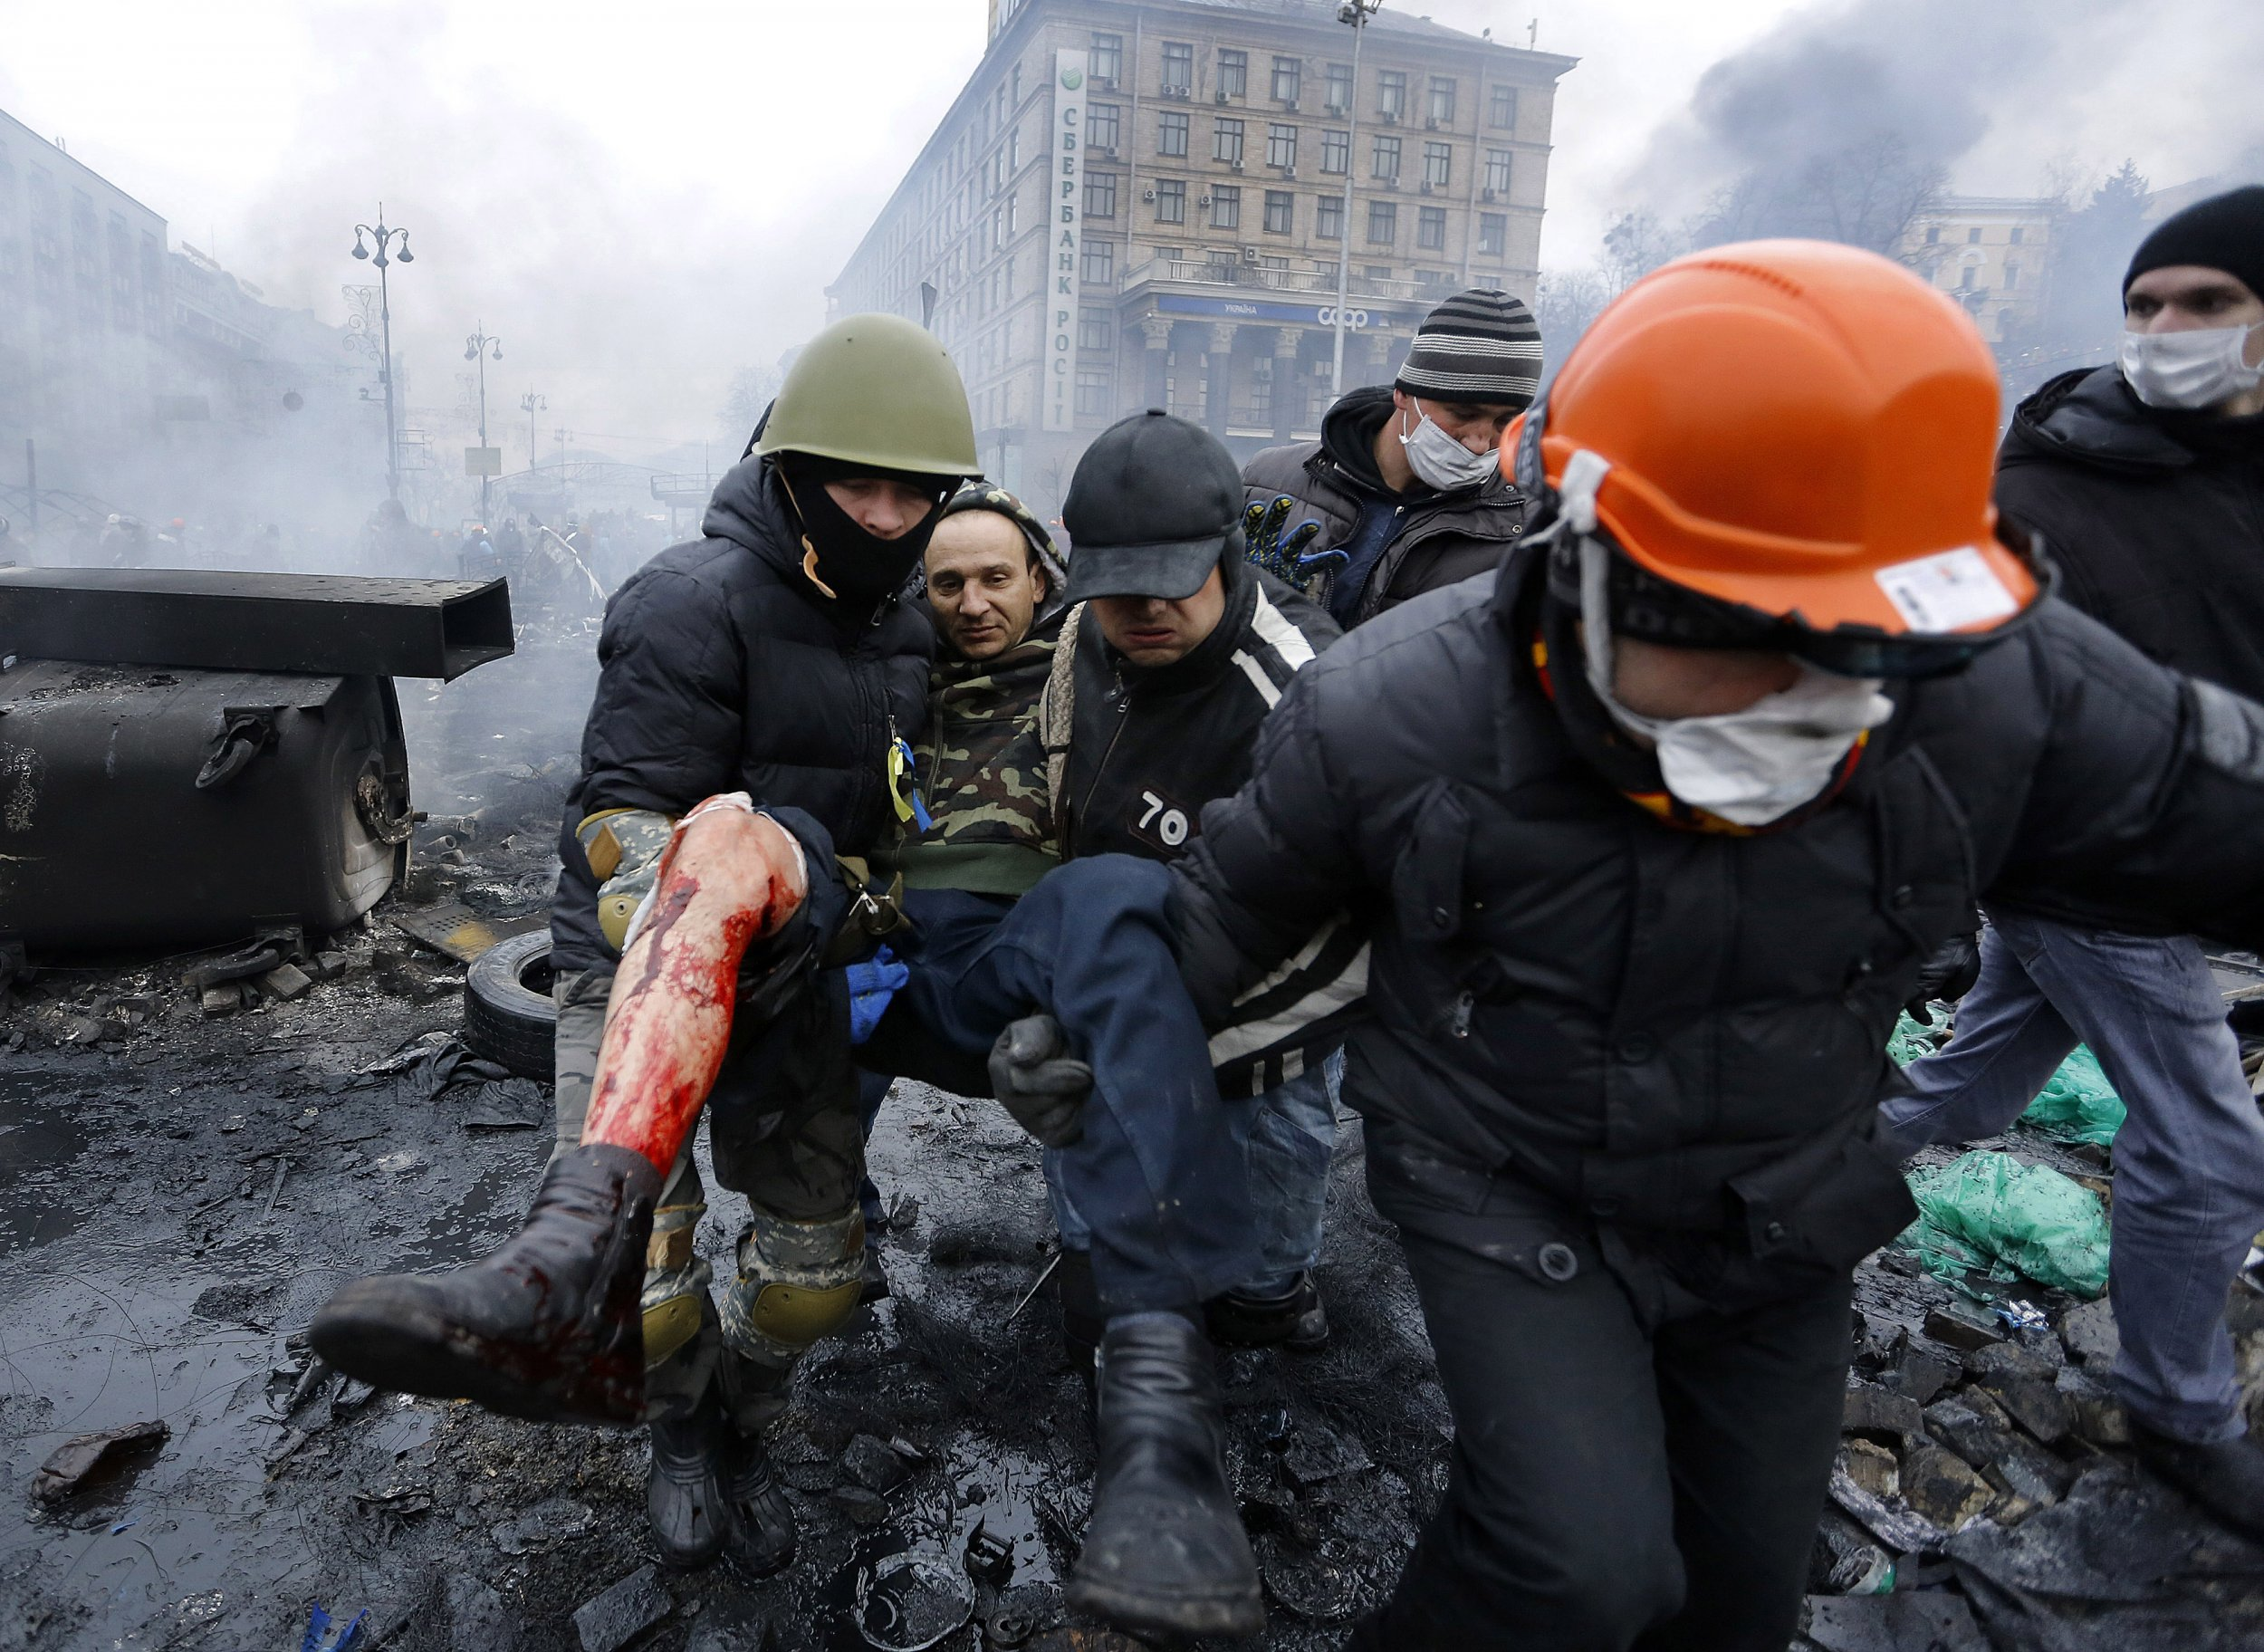 Ukraine injury protester